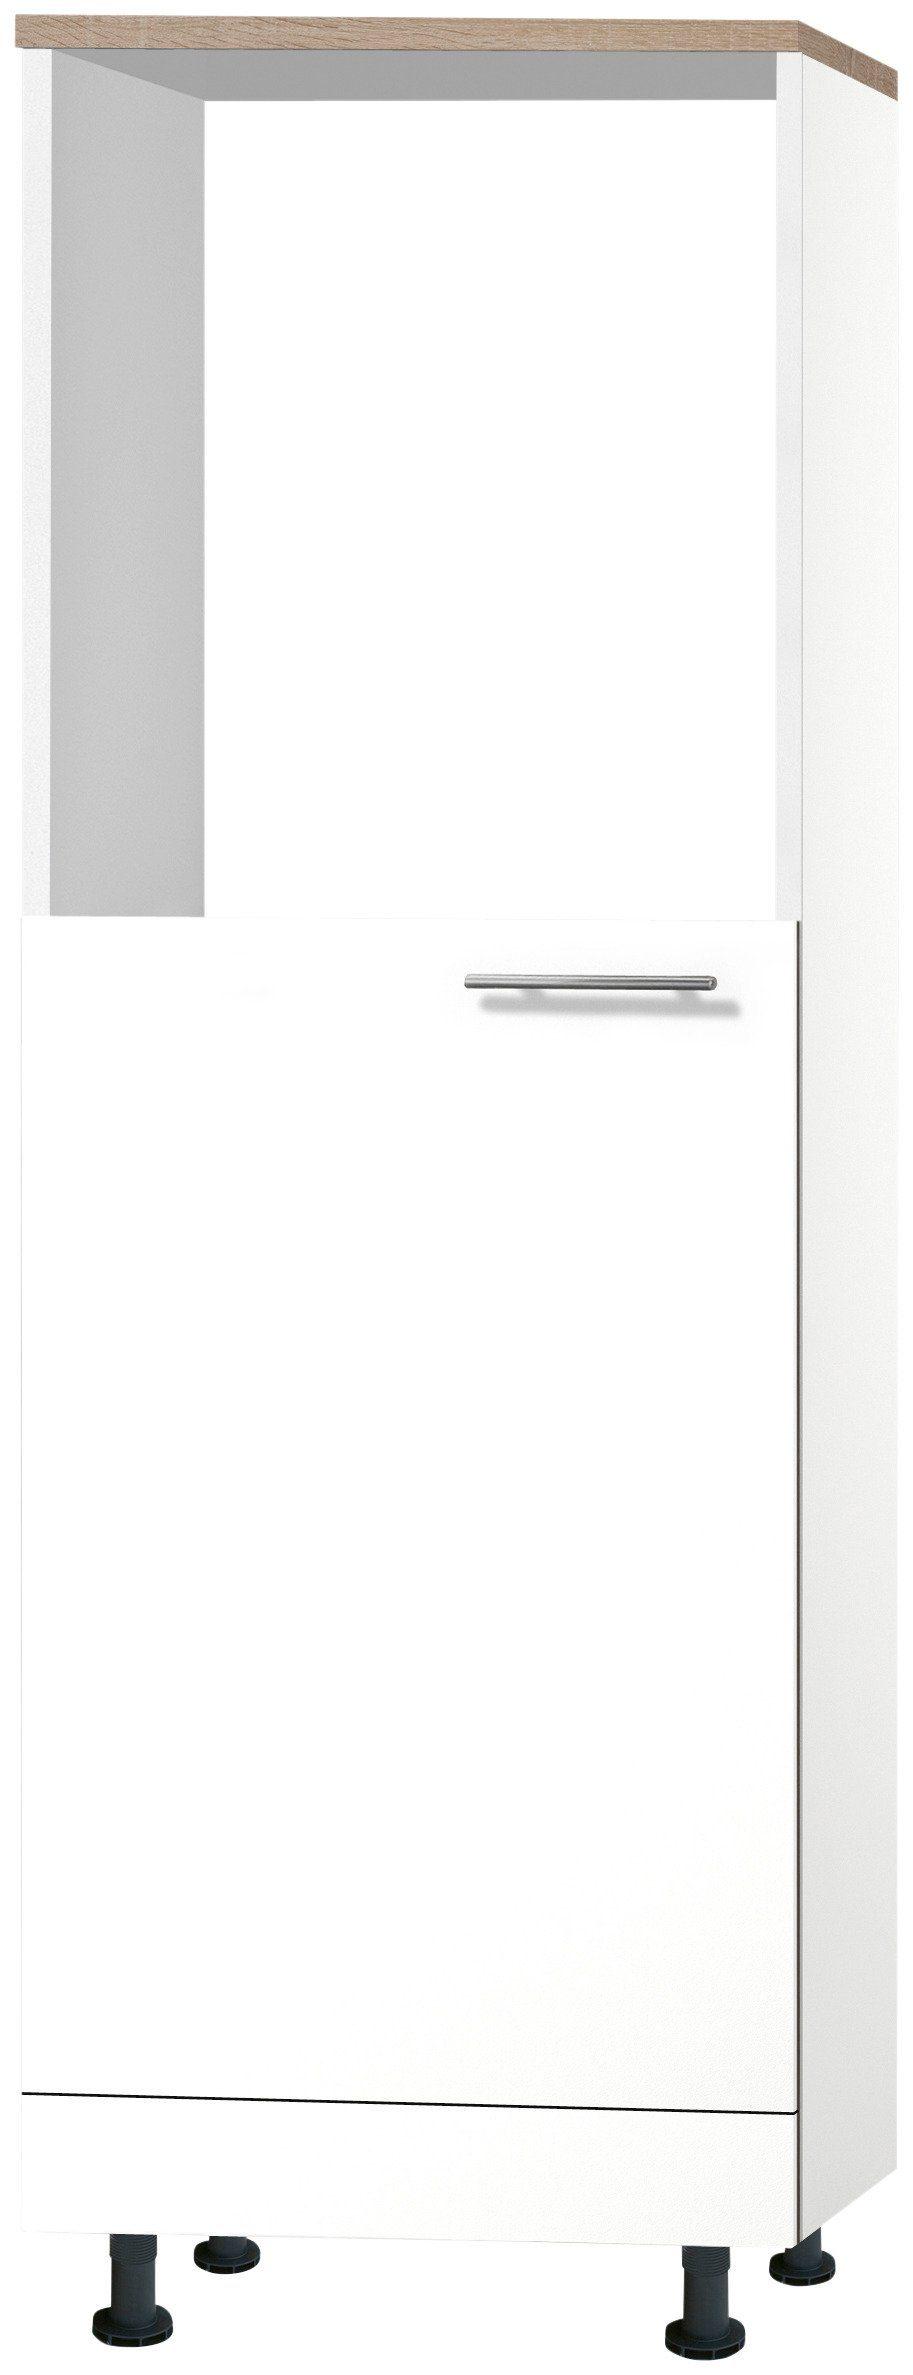 OPTIFIT Kombinierter Backofen-Kühlumbauschrank »Michel, Höhe 165 cm«